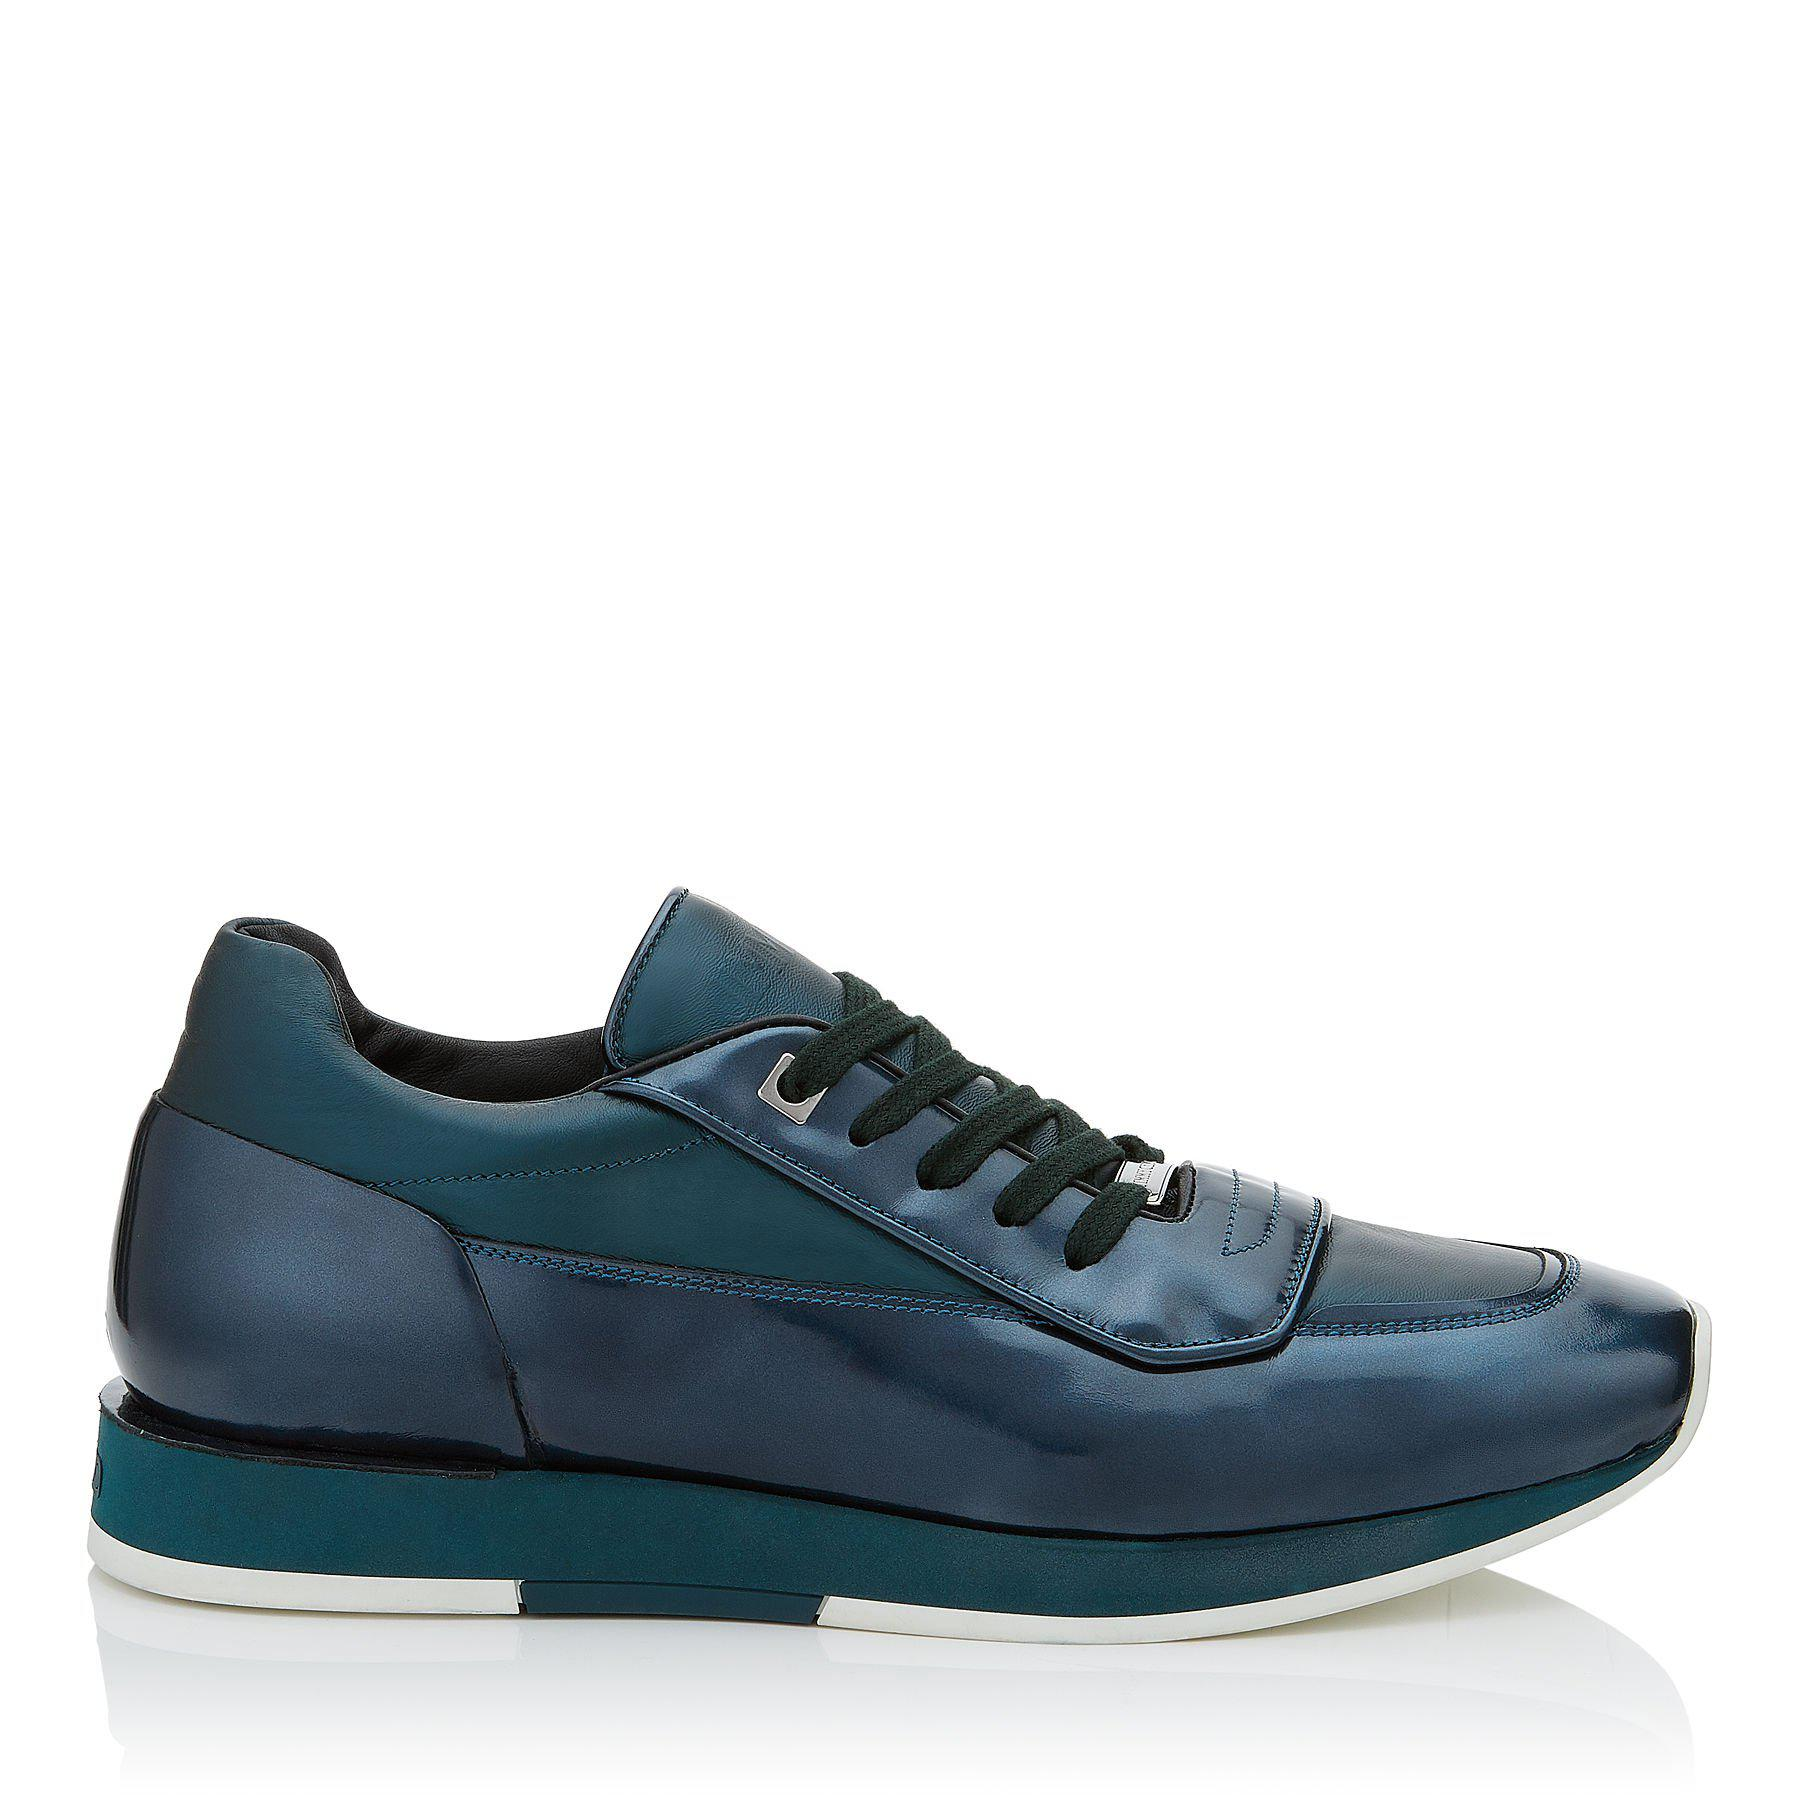 Jett sneakers - Blue Jimmy Choo London 4uIRg4